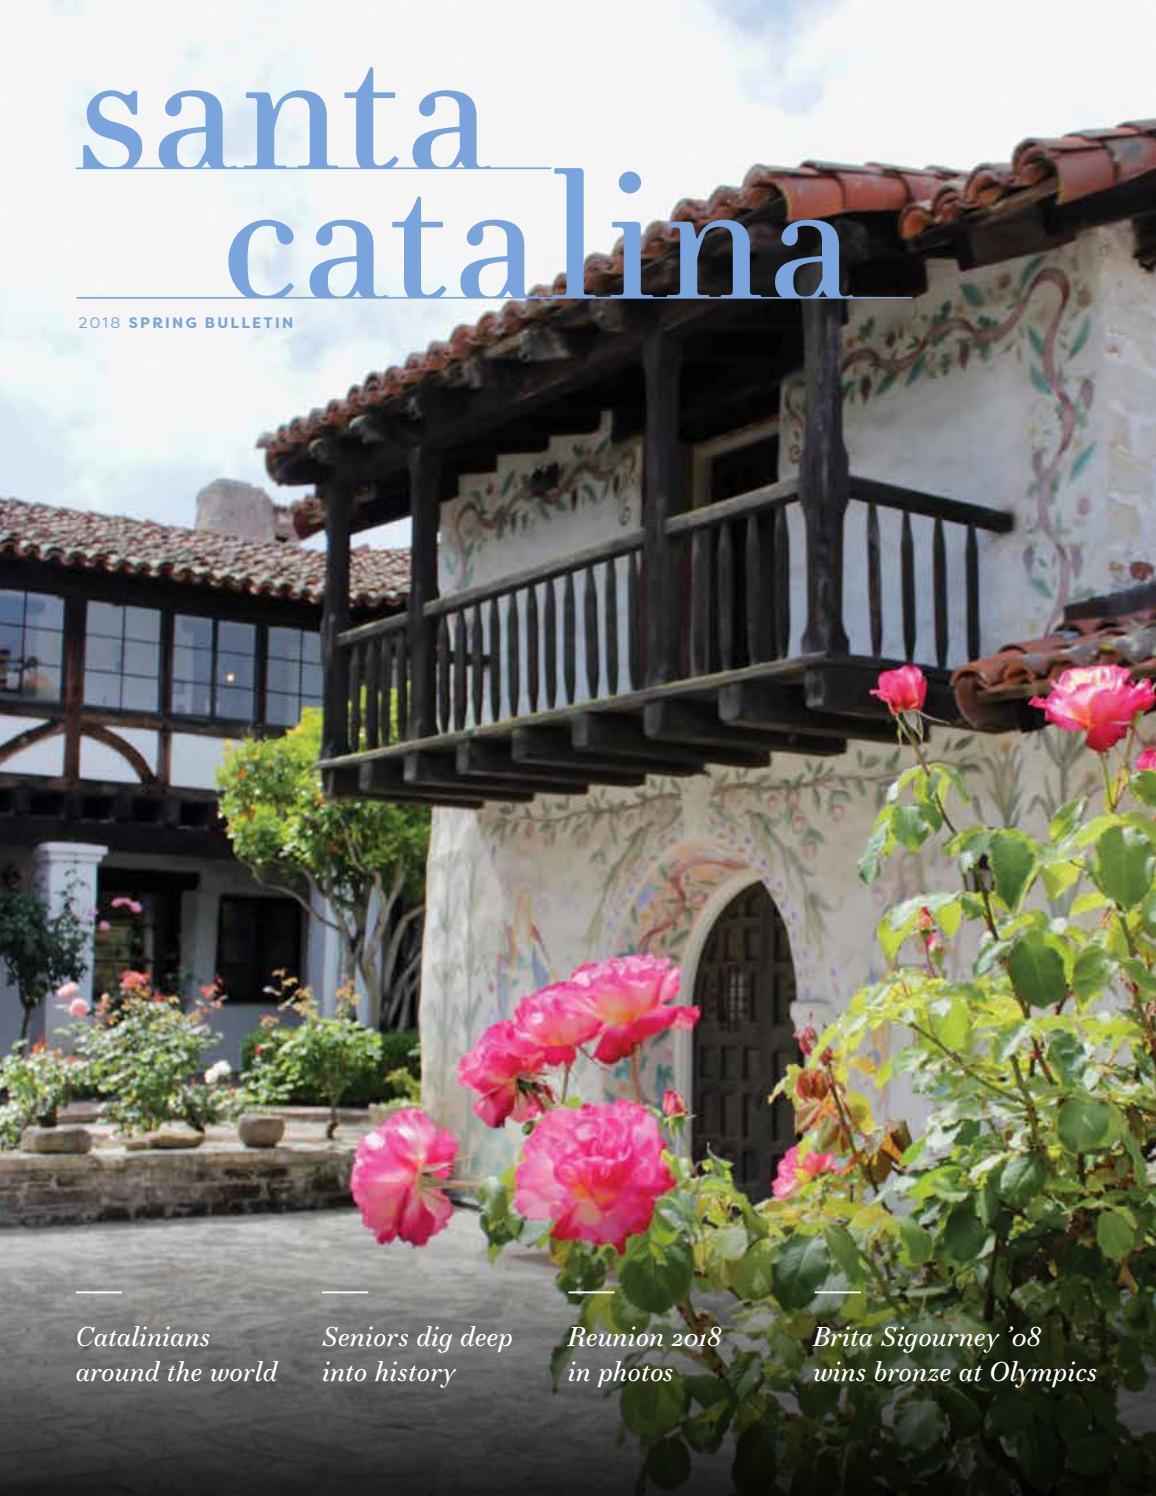 Santa Catalina School Bulletin Spring 2018 by santacatalina - issuu